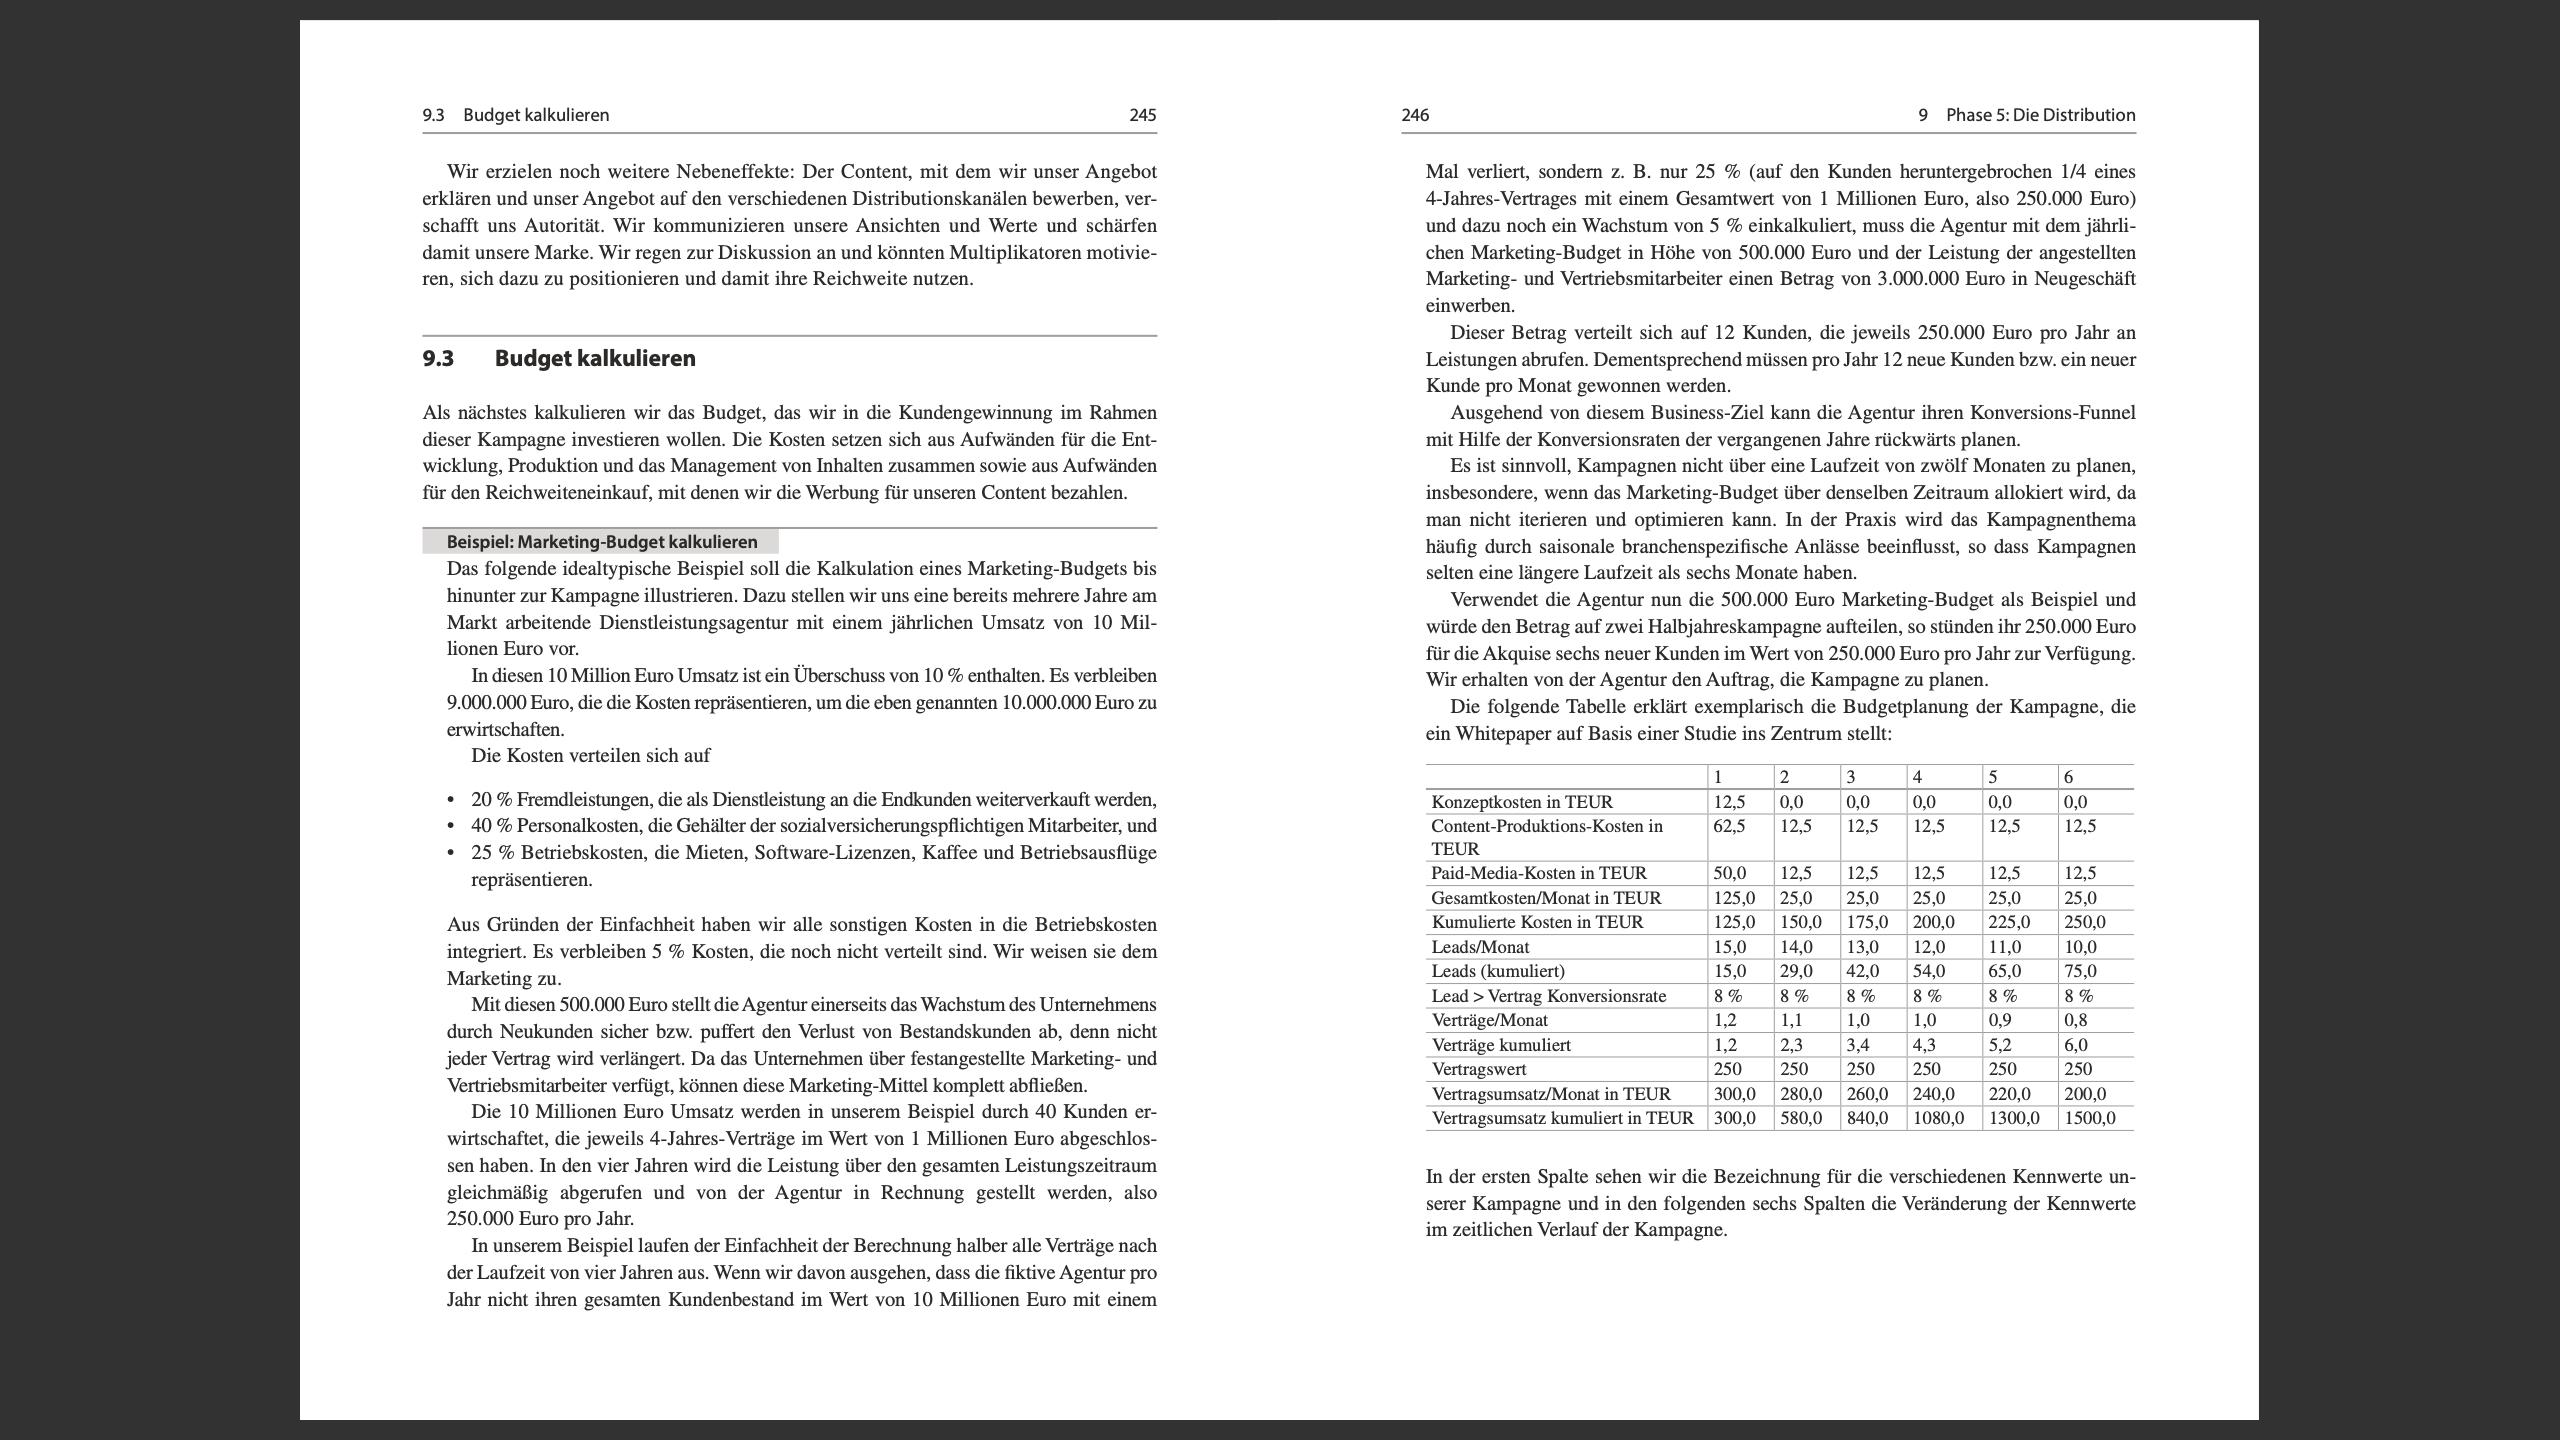 12-Methodisches-Content-Marketing-Gerrit-Grunert